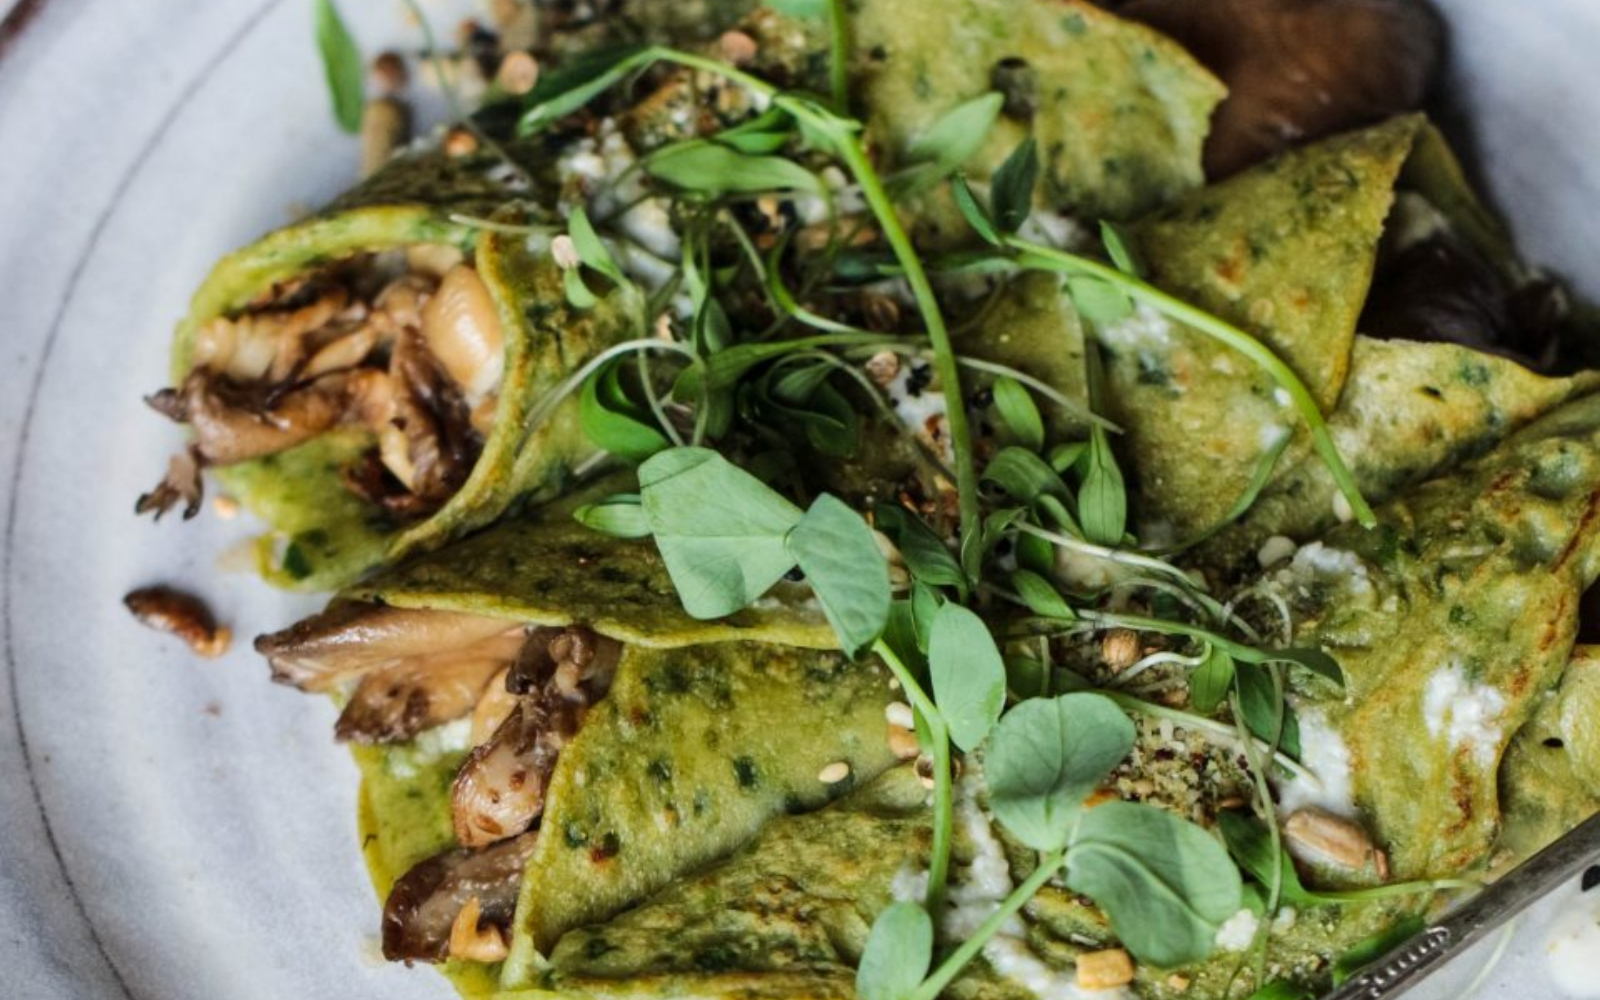 Vegan Gluten-Free Buckwheat Spinach Crepes with Mushrooms, Basil Pesto and Tahini Dressing